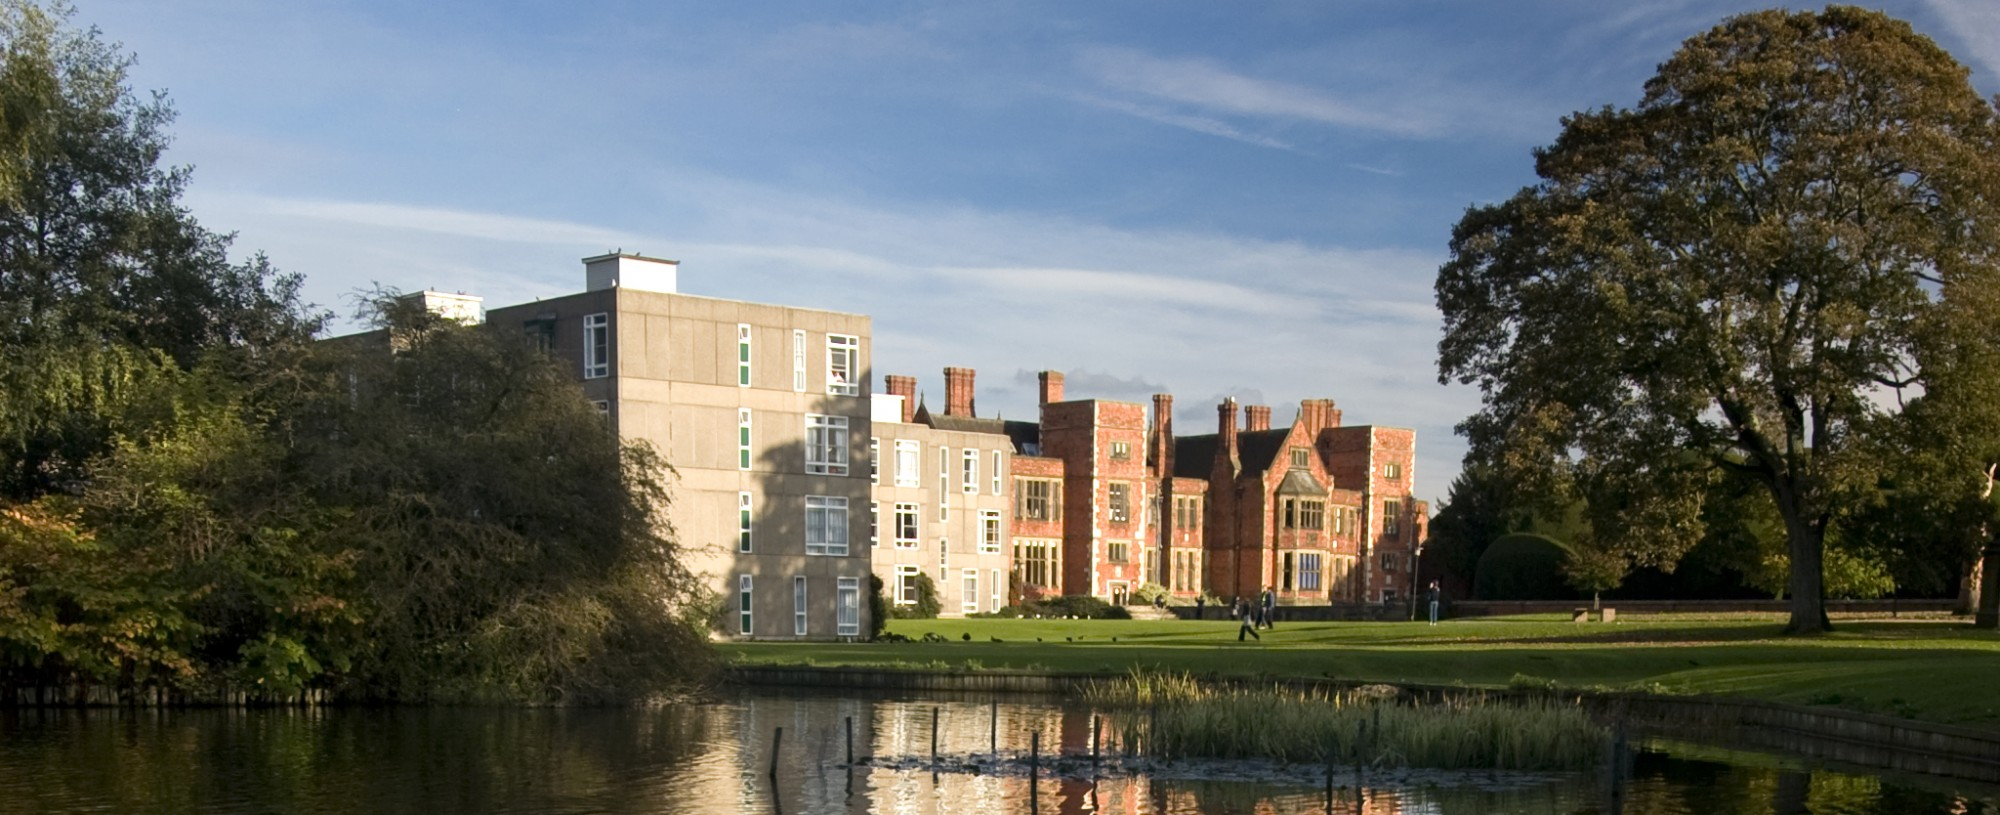 University of York 1